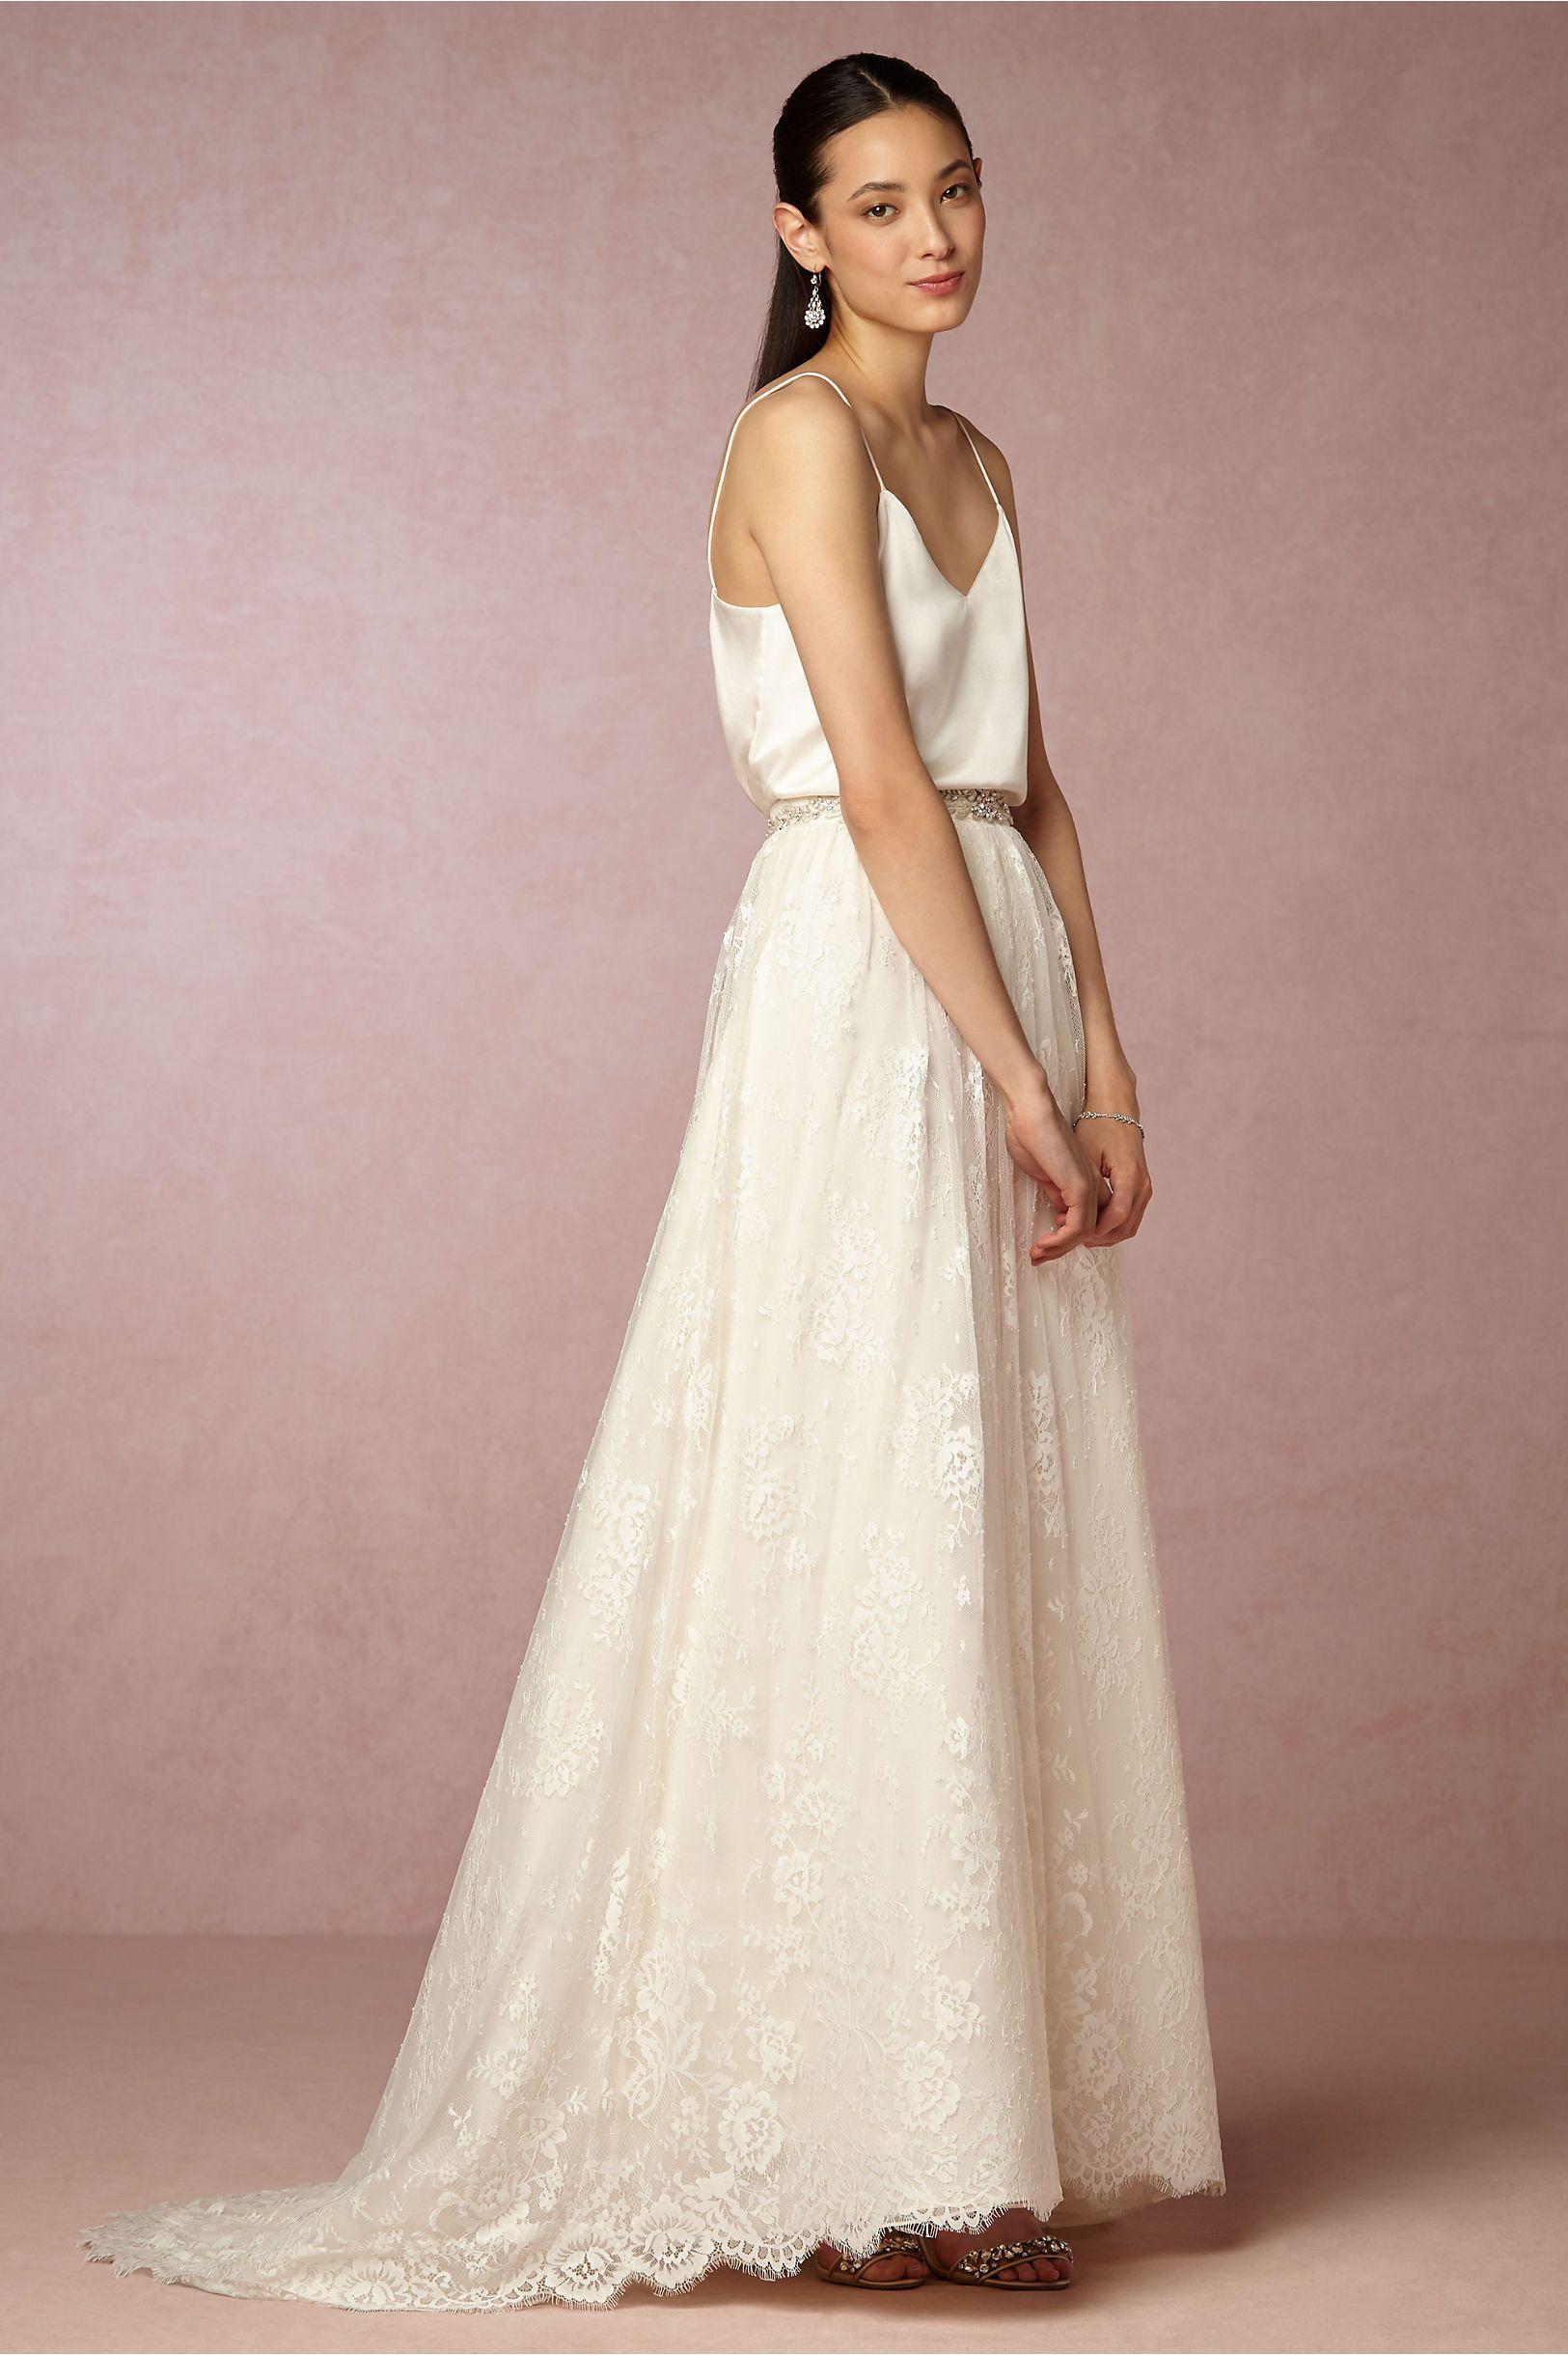 987aabaf5d BHLDN Mia Top in Bride Bridal Separates Tops   BHLDN. Dresses .